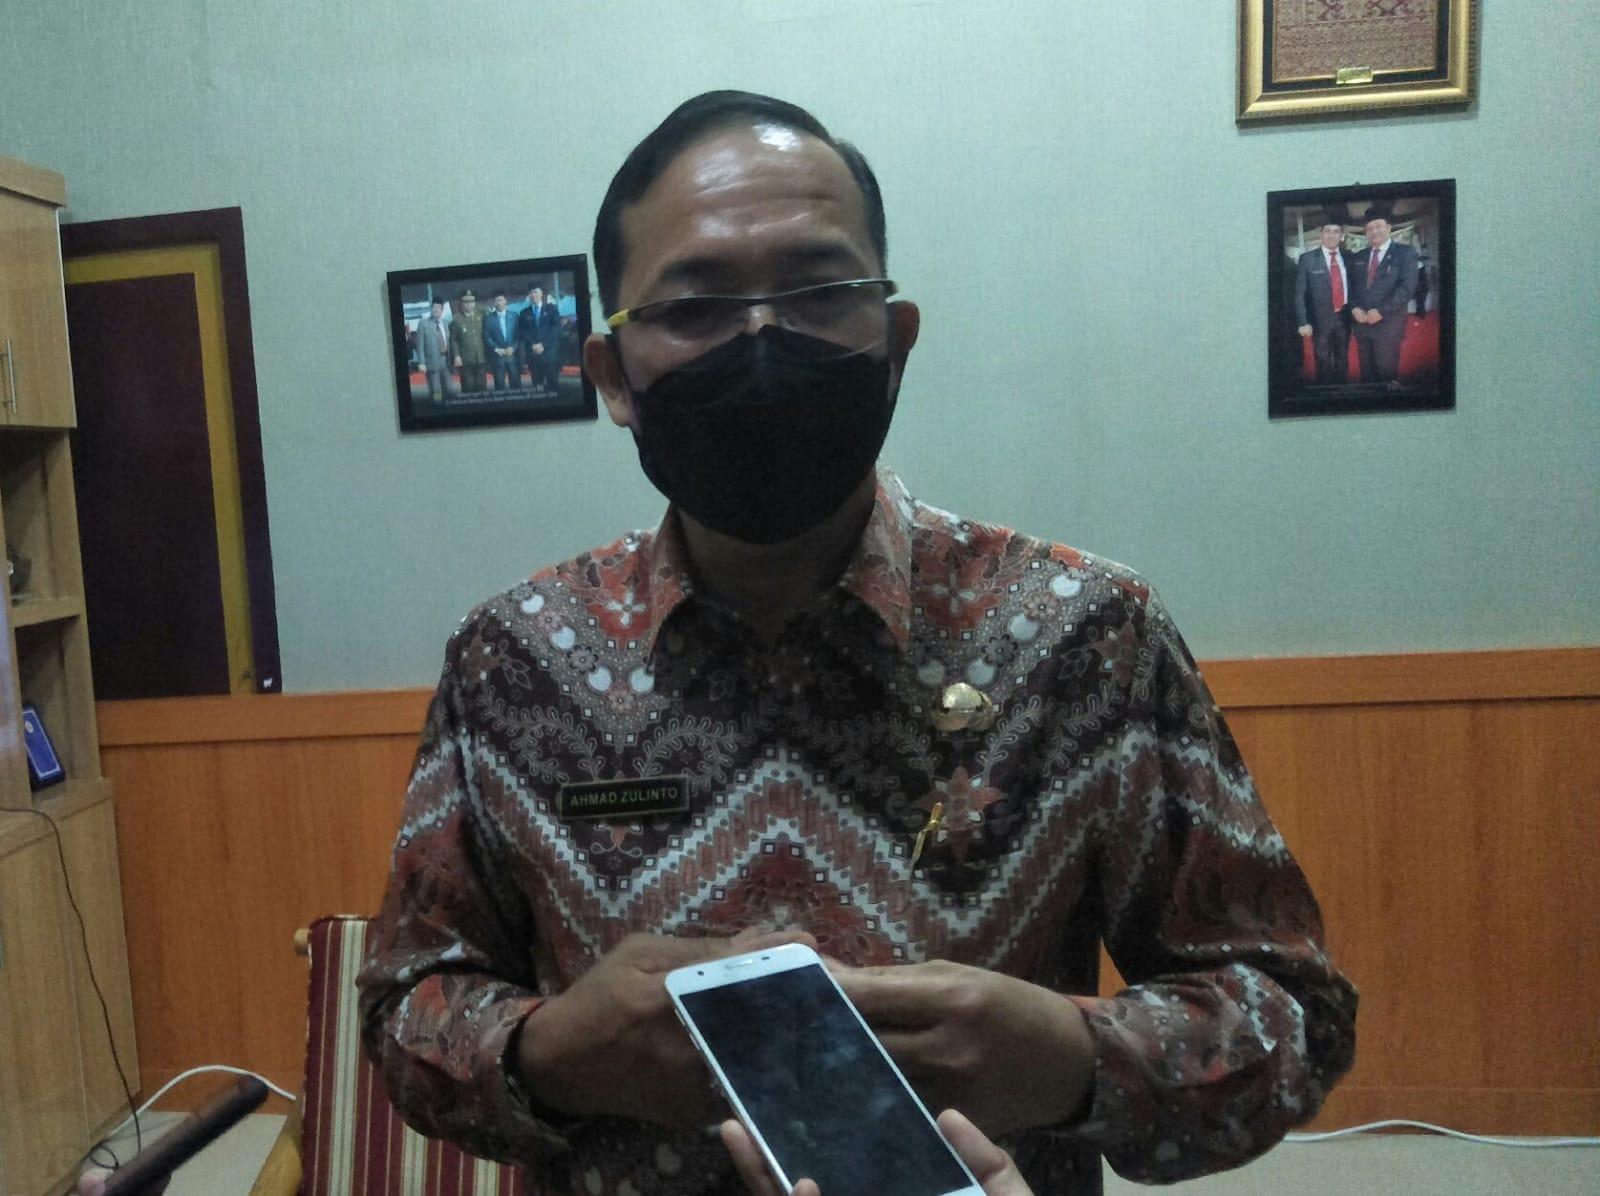 Ketua PGRI Sumsel Ahmad Zulinto